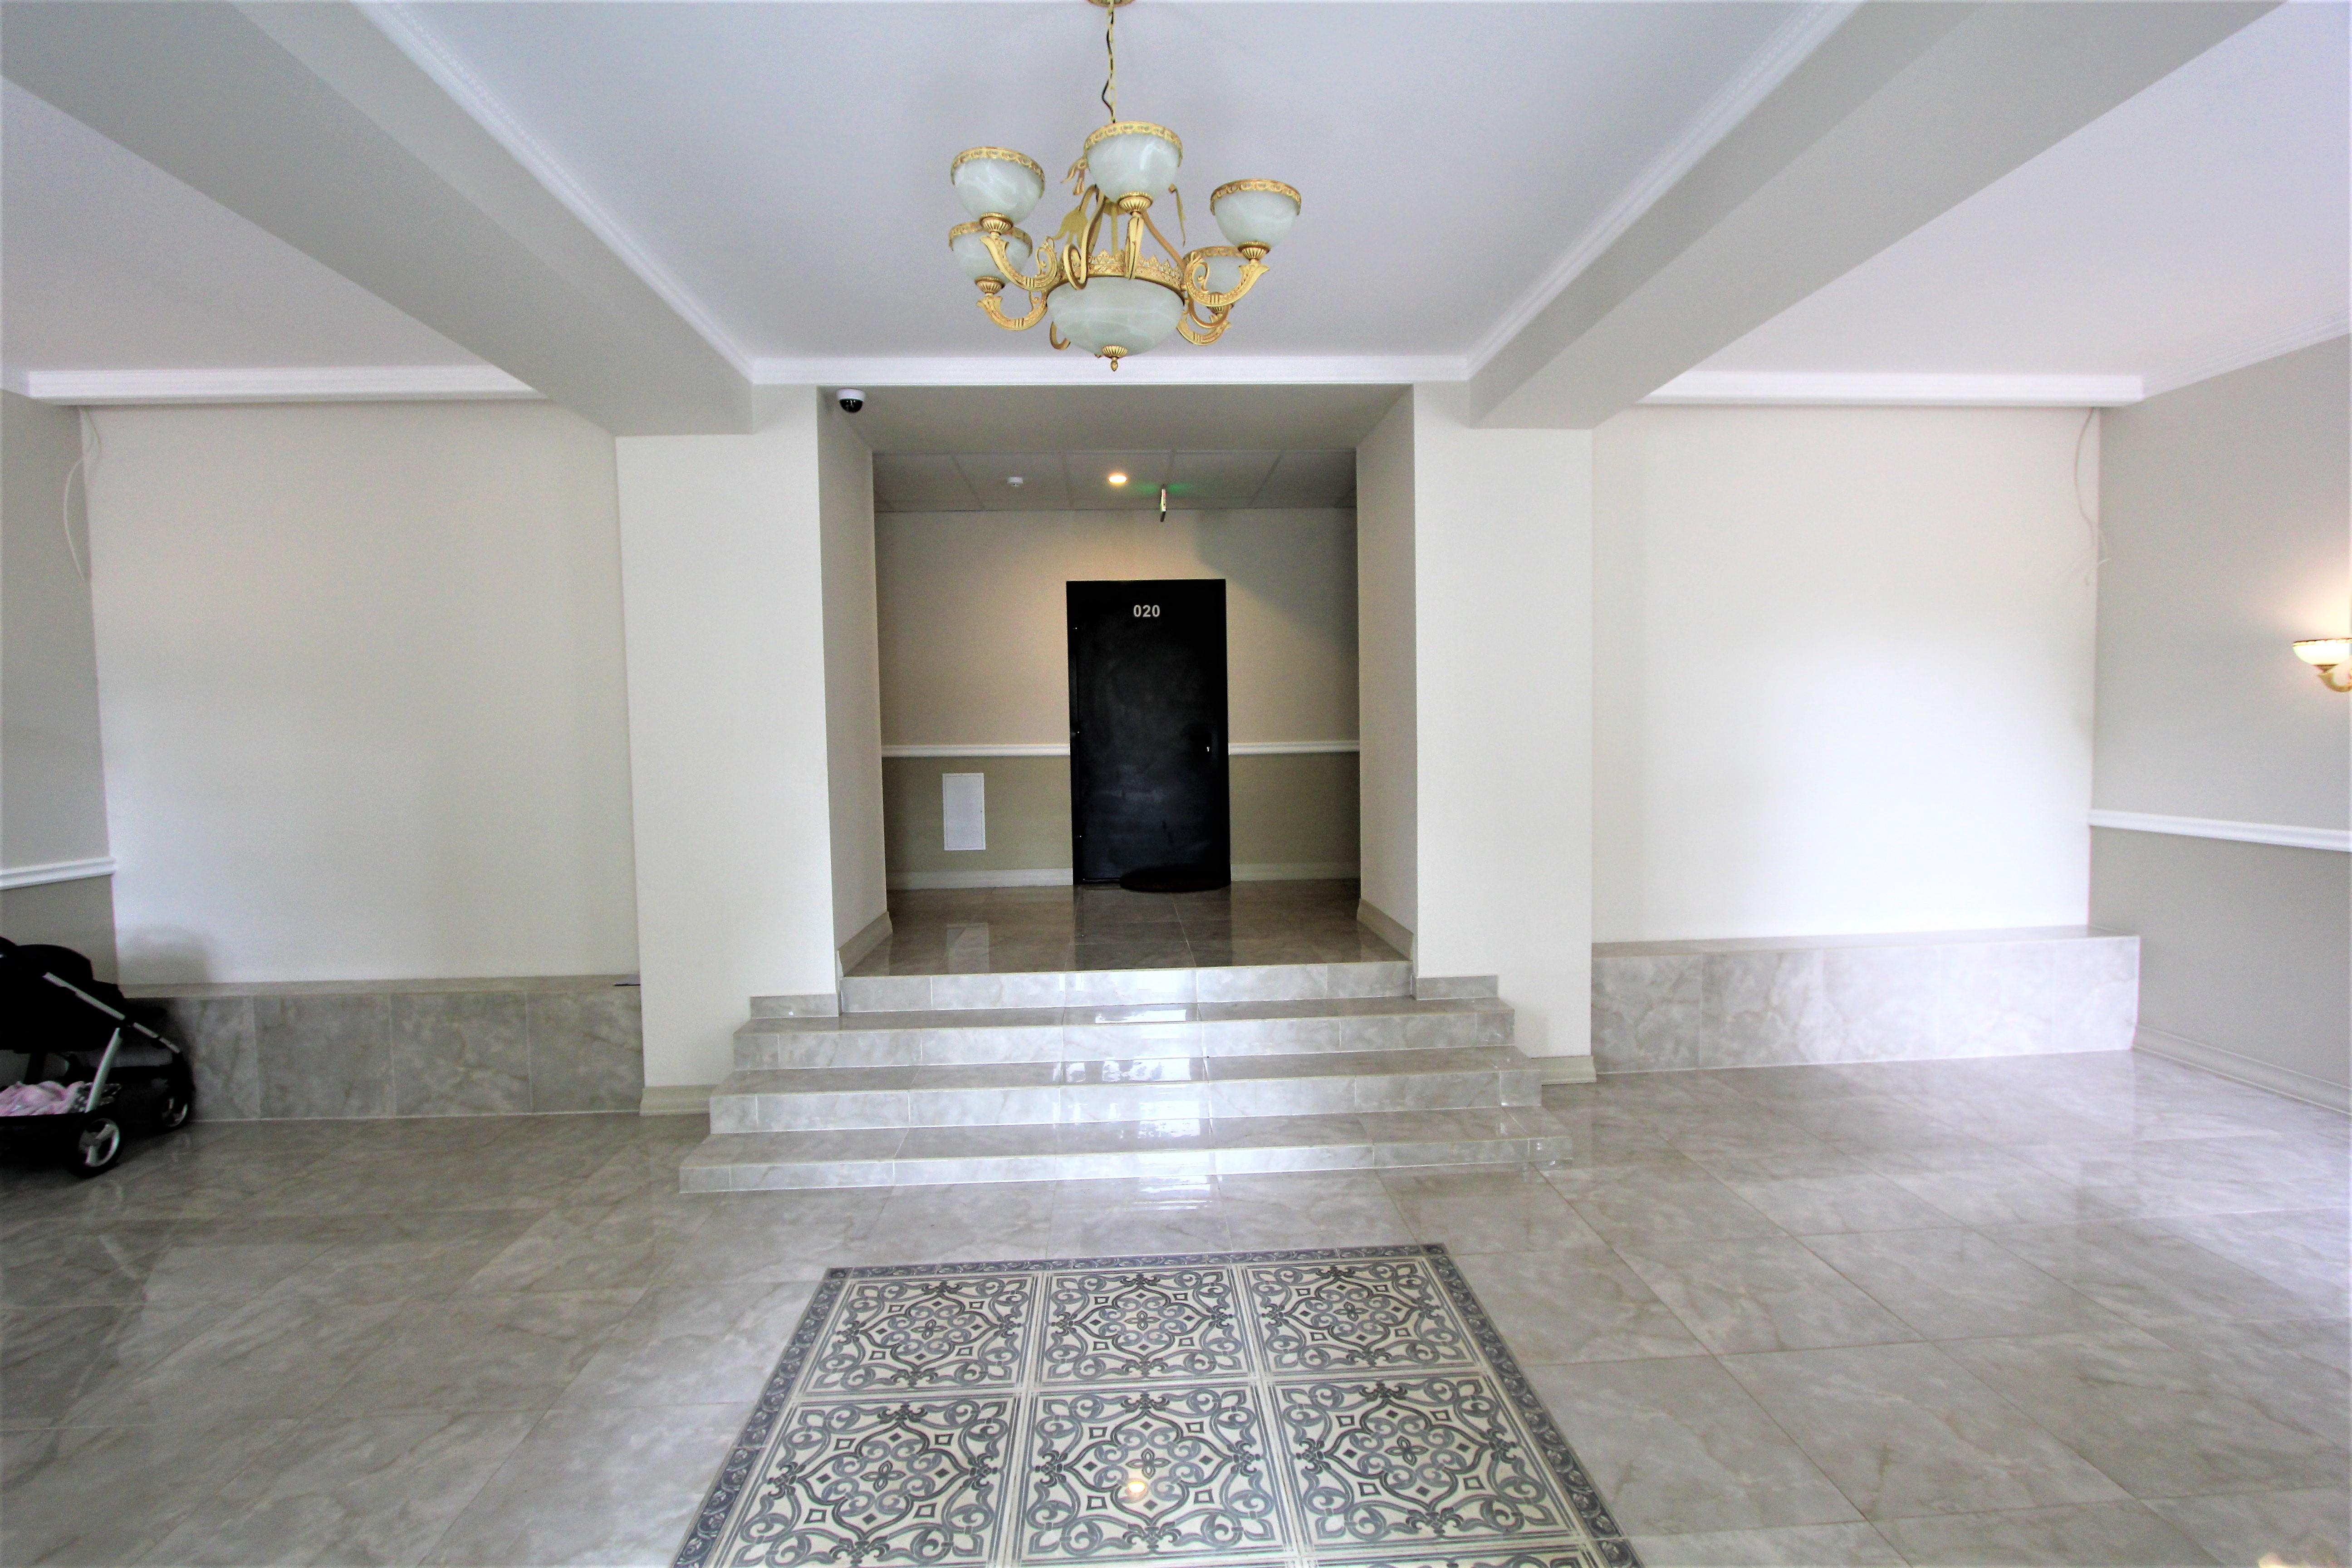 Apartment for sale, Emmas street 28 - Image 1